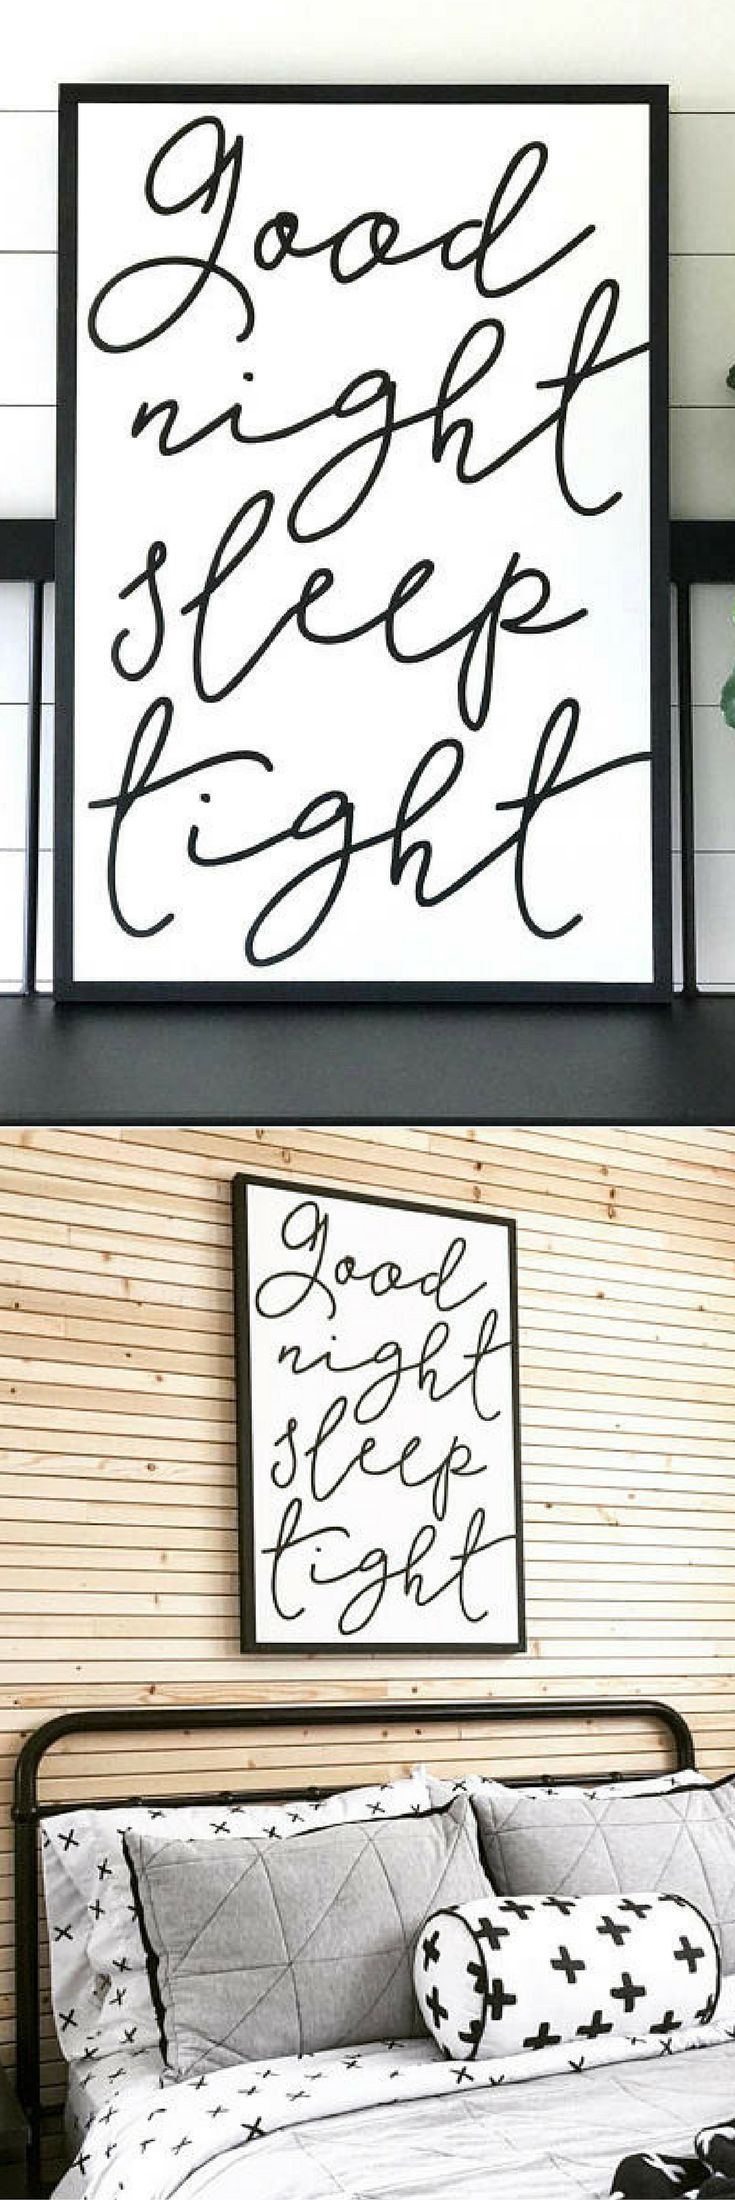 "GOOD NIGHT Sleep Tight Painted Wood Sign - 24x36""   Wall decor, Rustic Chic, Modern Farmhouse, nursery decor, bedroom art, rustic decor, farmhouse decor #ad #affiliatelink"